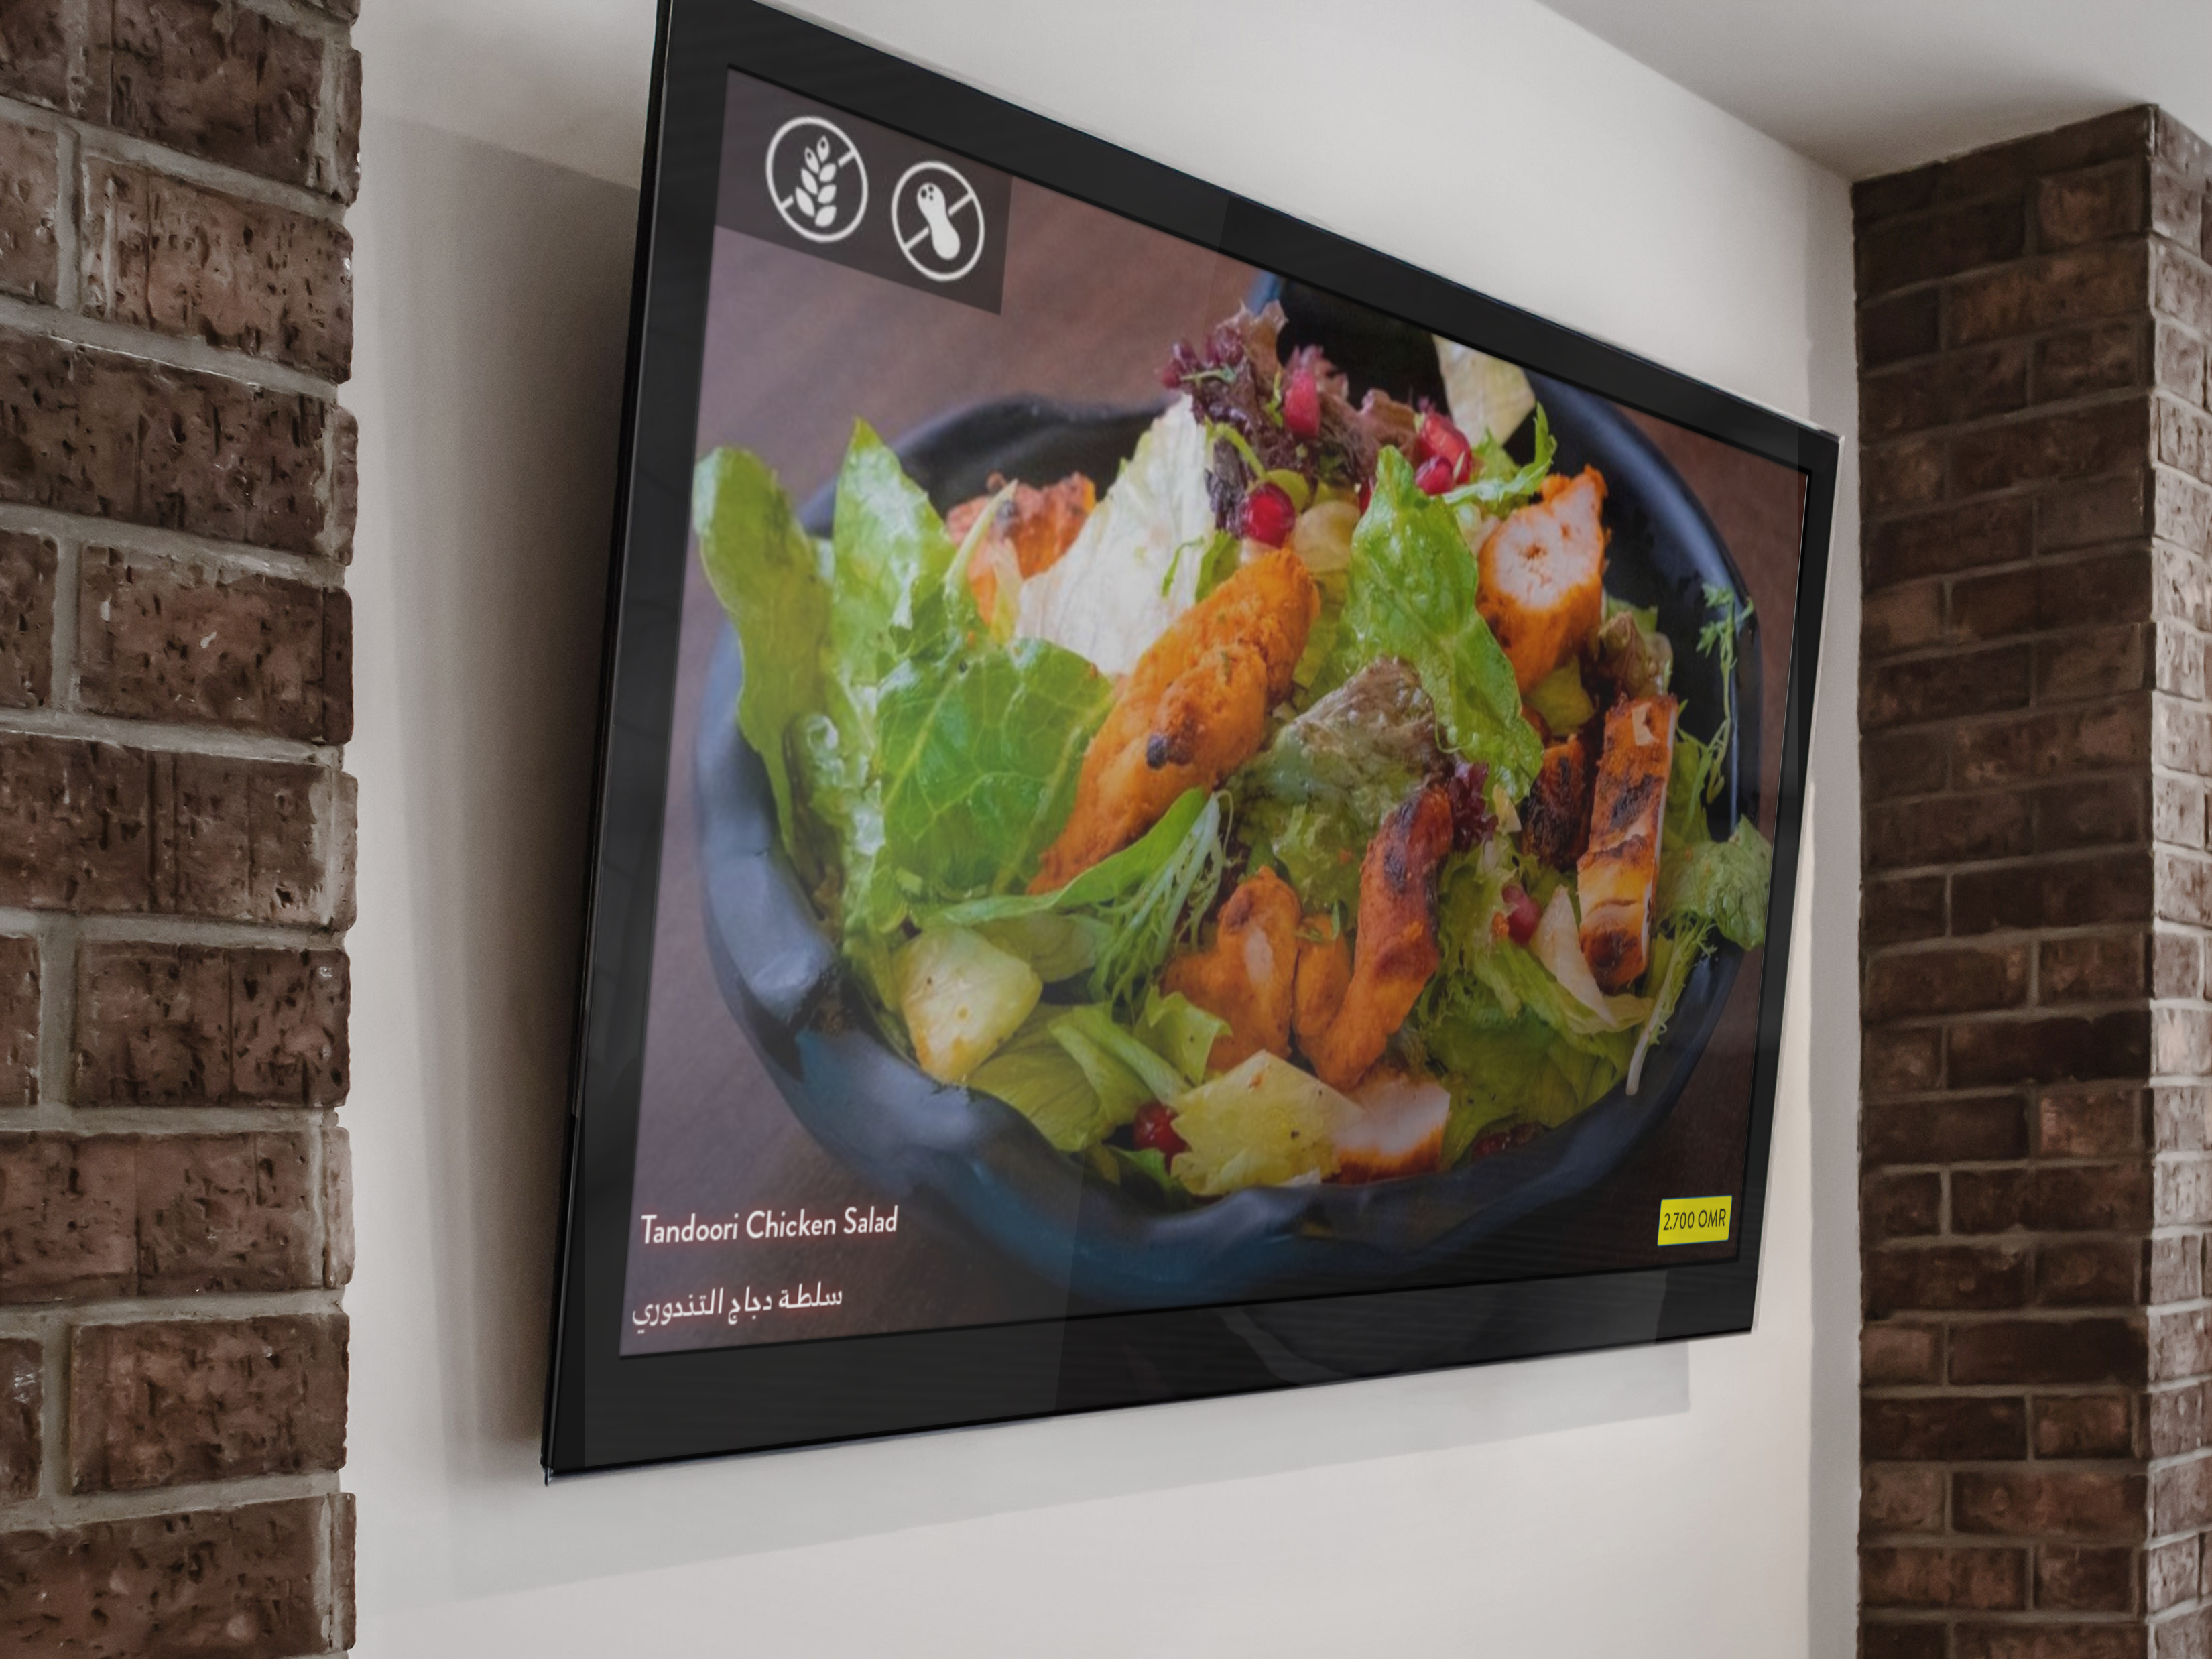 Qatar Delicious - Menu on Smart TV